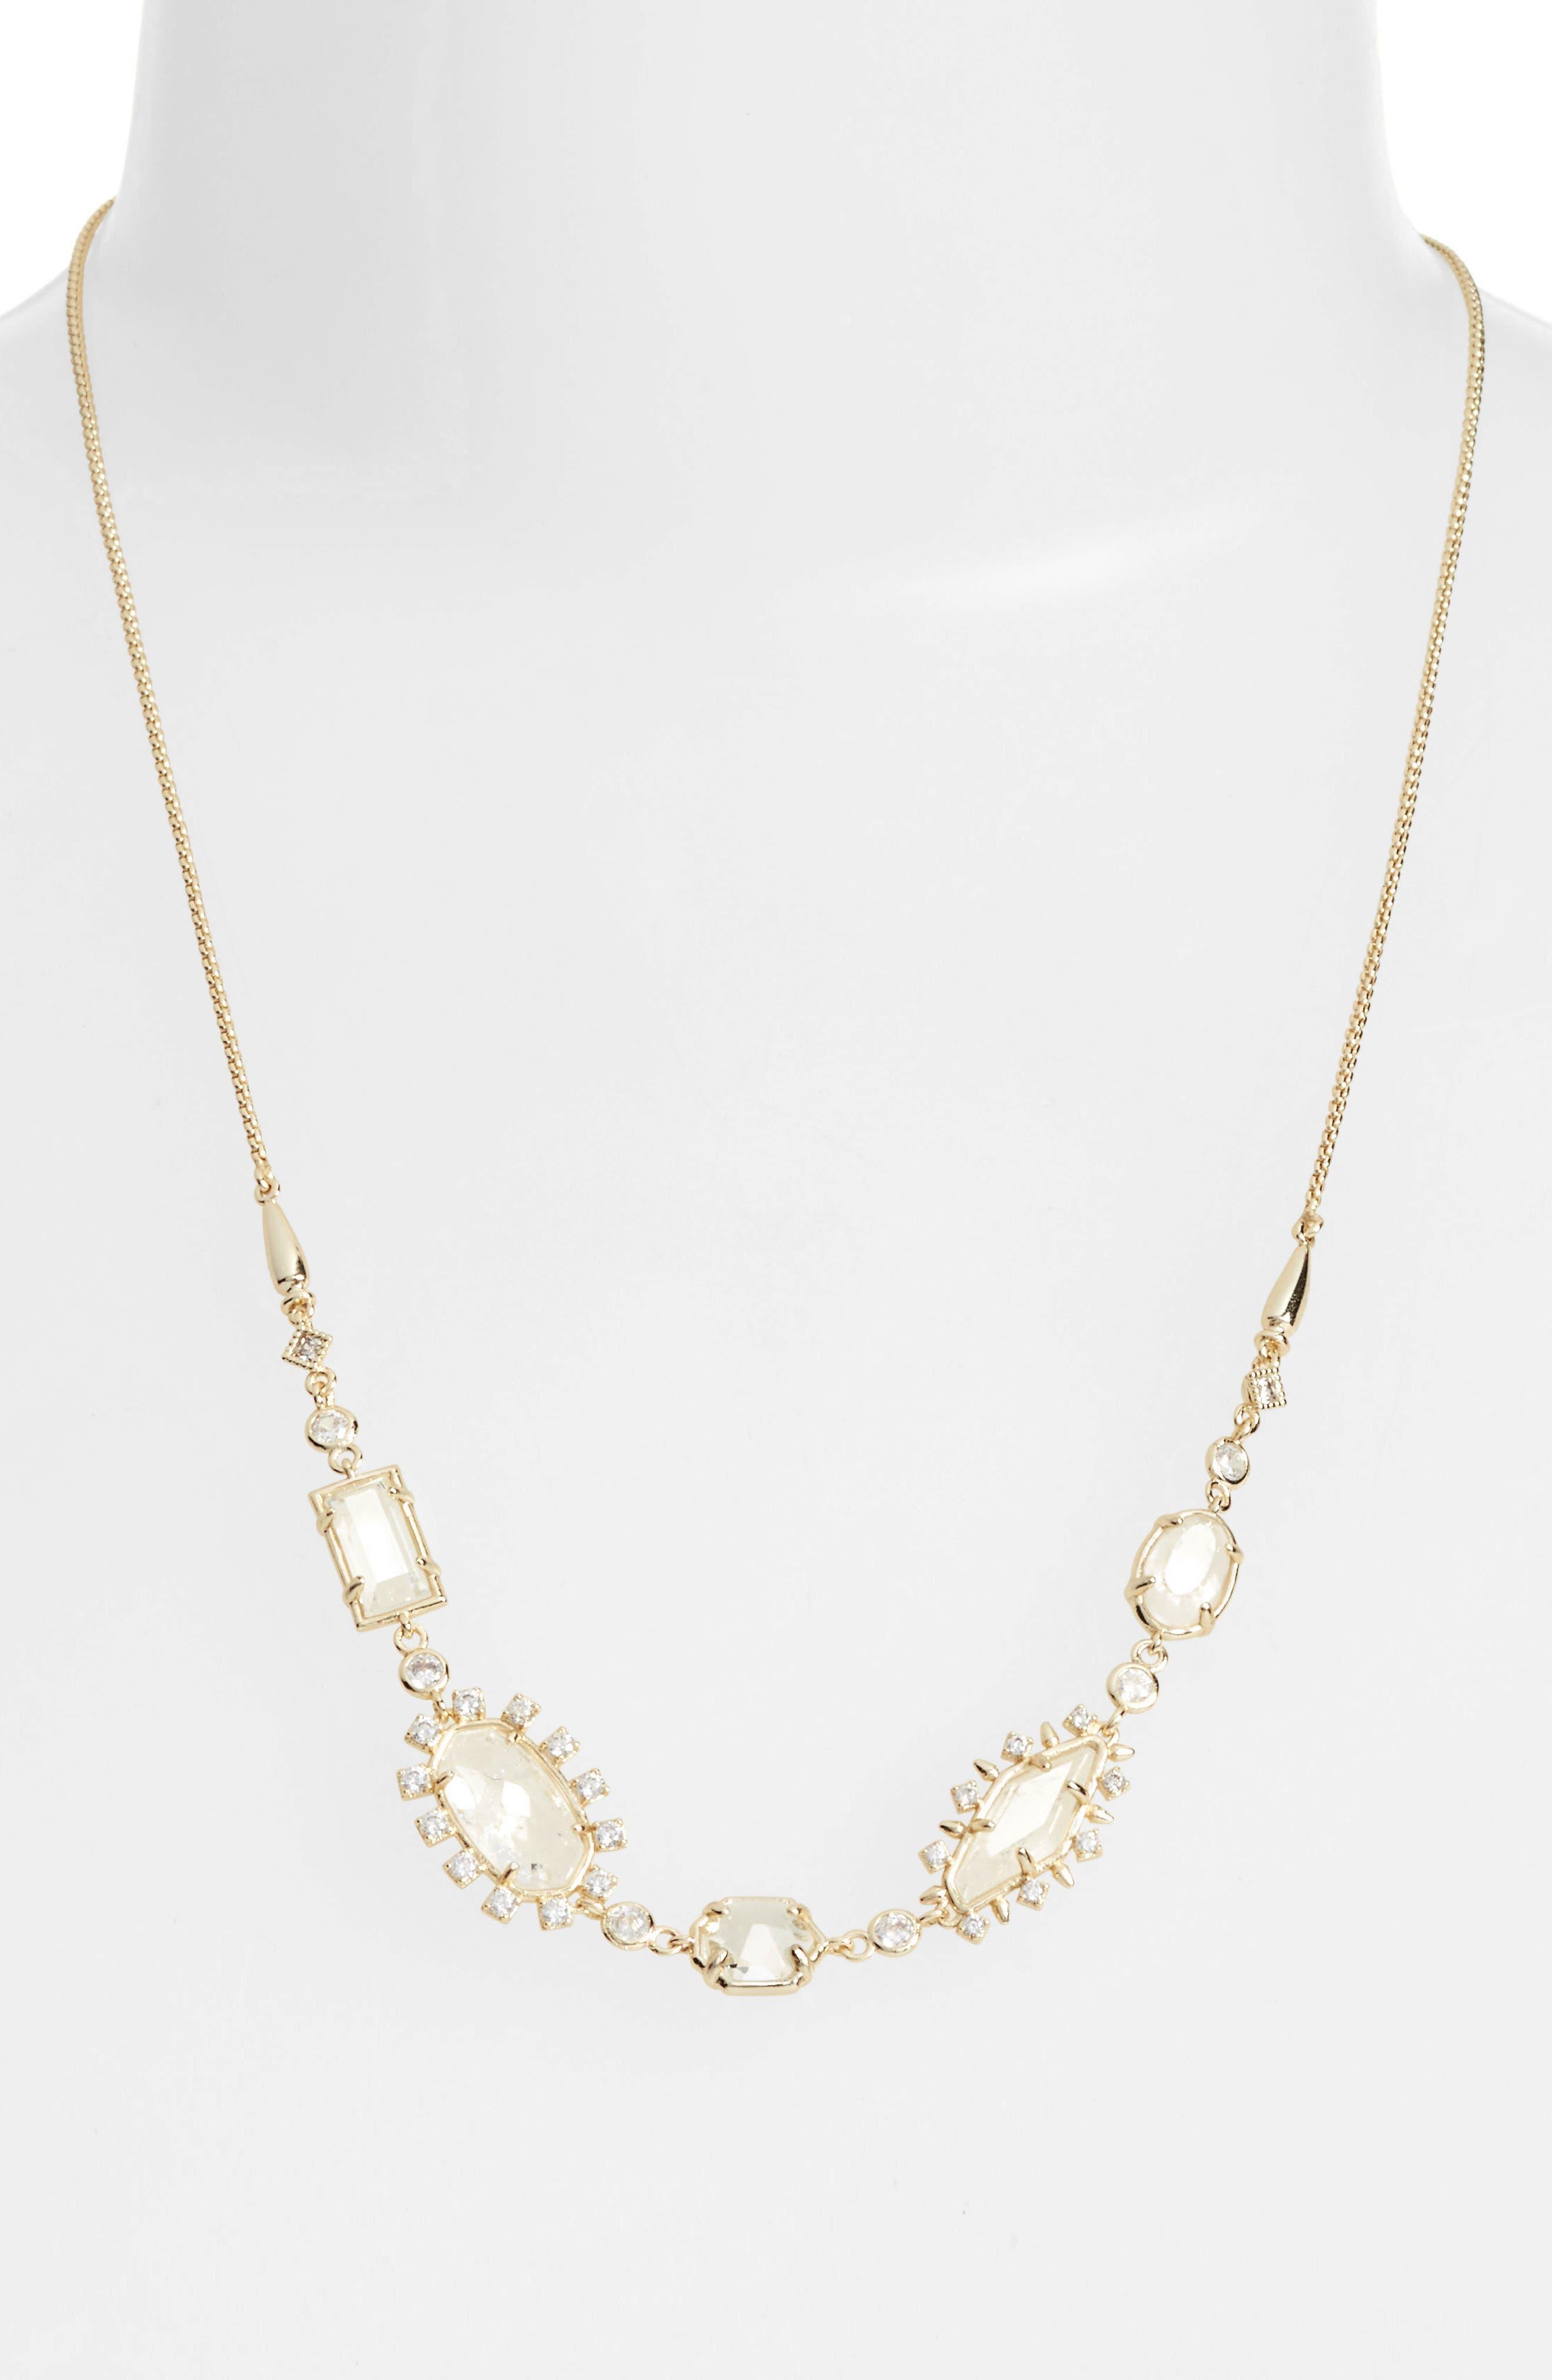 Kendra Scott June Convertible Necklace